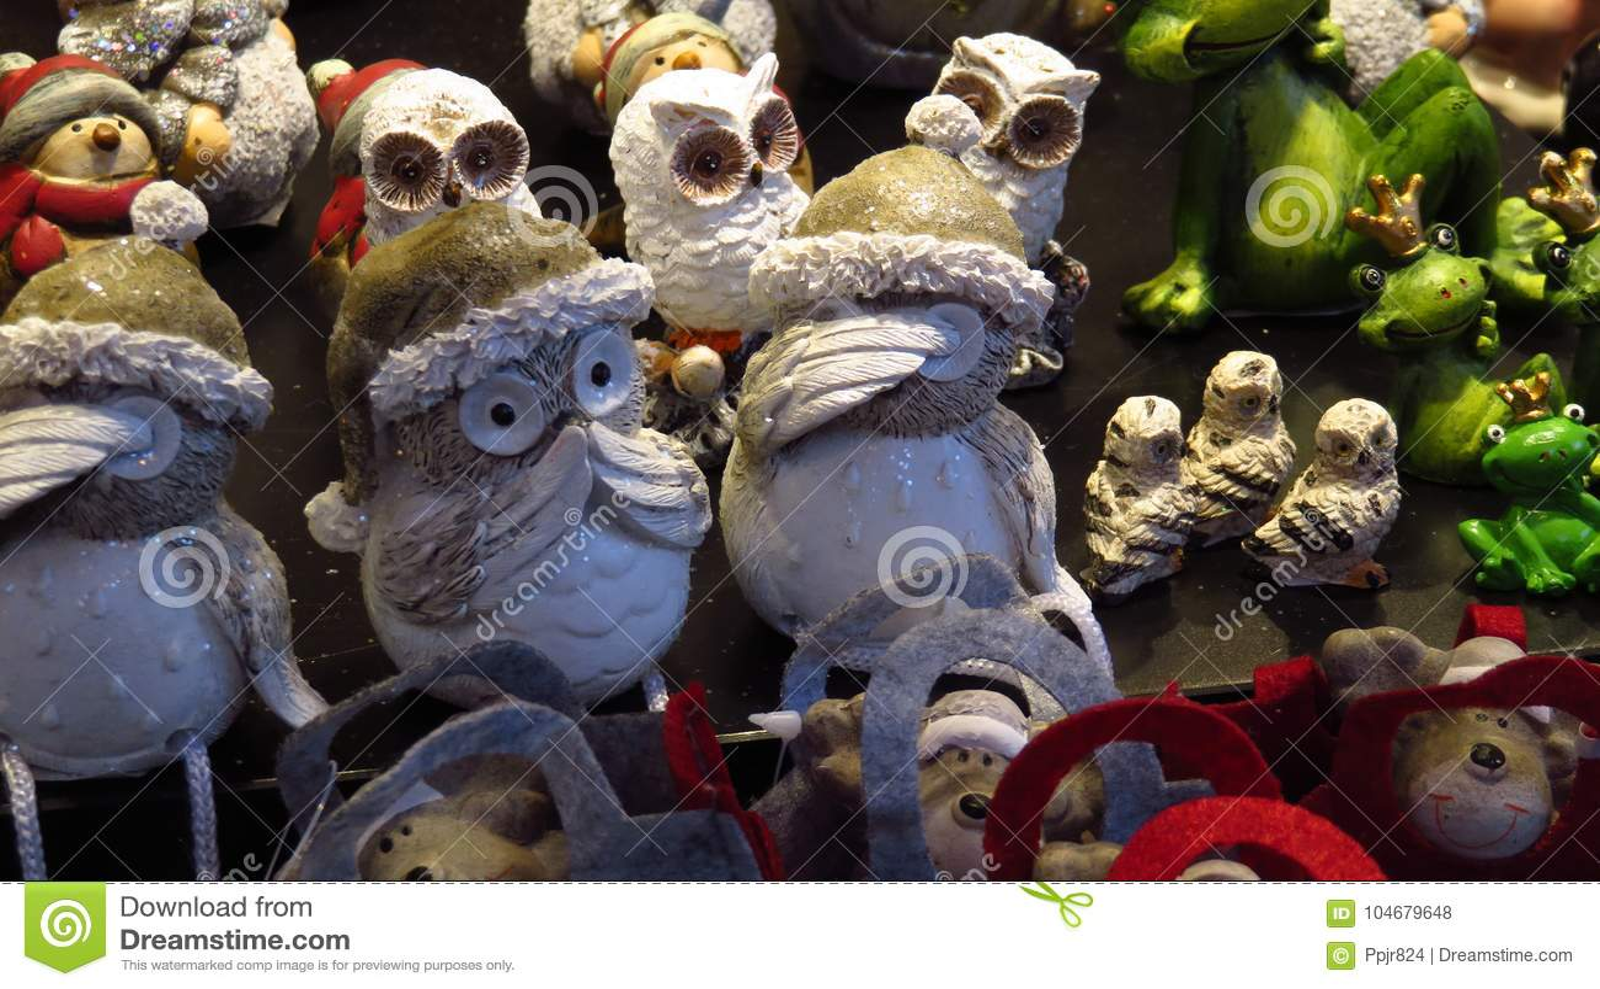 fa715a8e77367 Decorative Christmas Owls With Christmas Hats Stock Photo - Image of ...